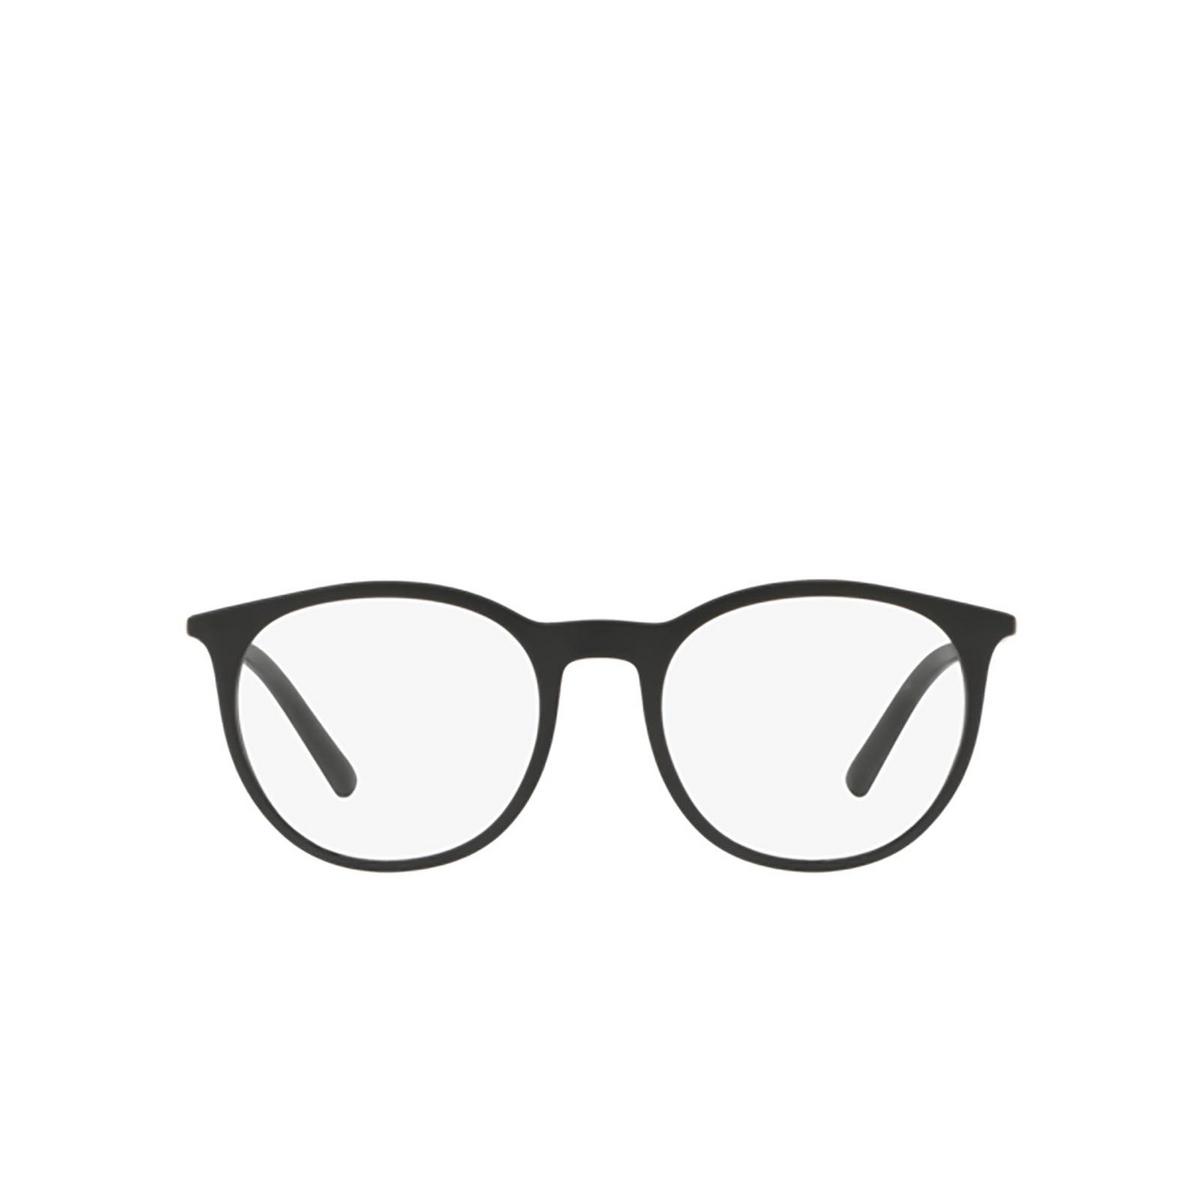 Dolce & Gabbana® Round Eyeglasses: DG5031 color Matte Black 2525 - front view.